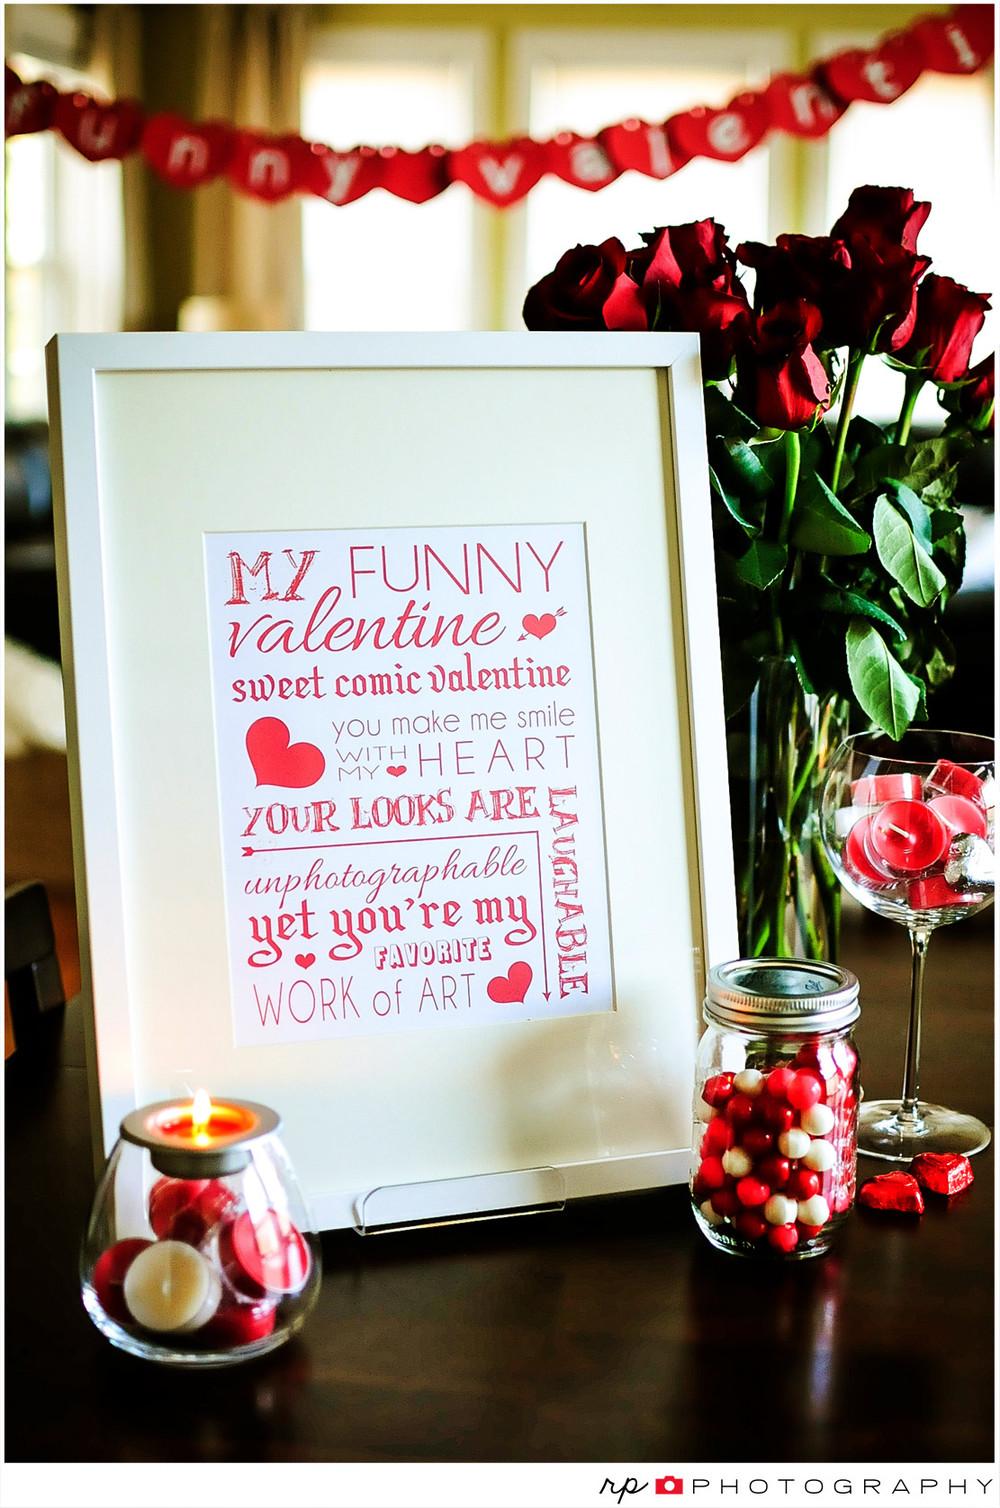 funny-valentine-2-1-frame.jpg